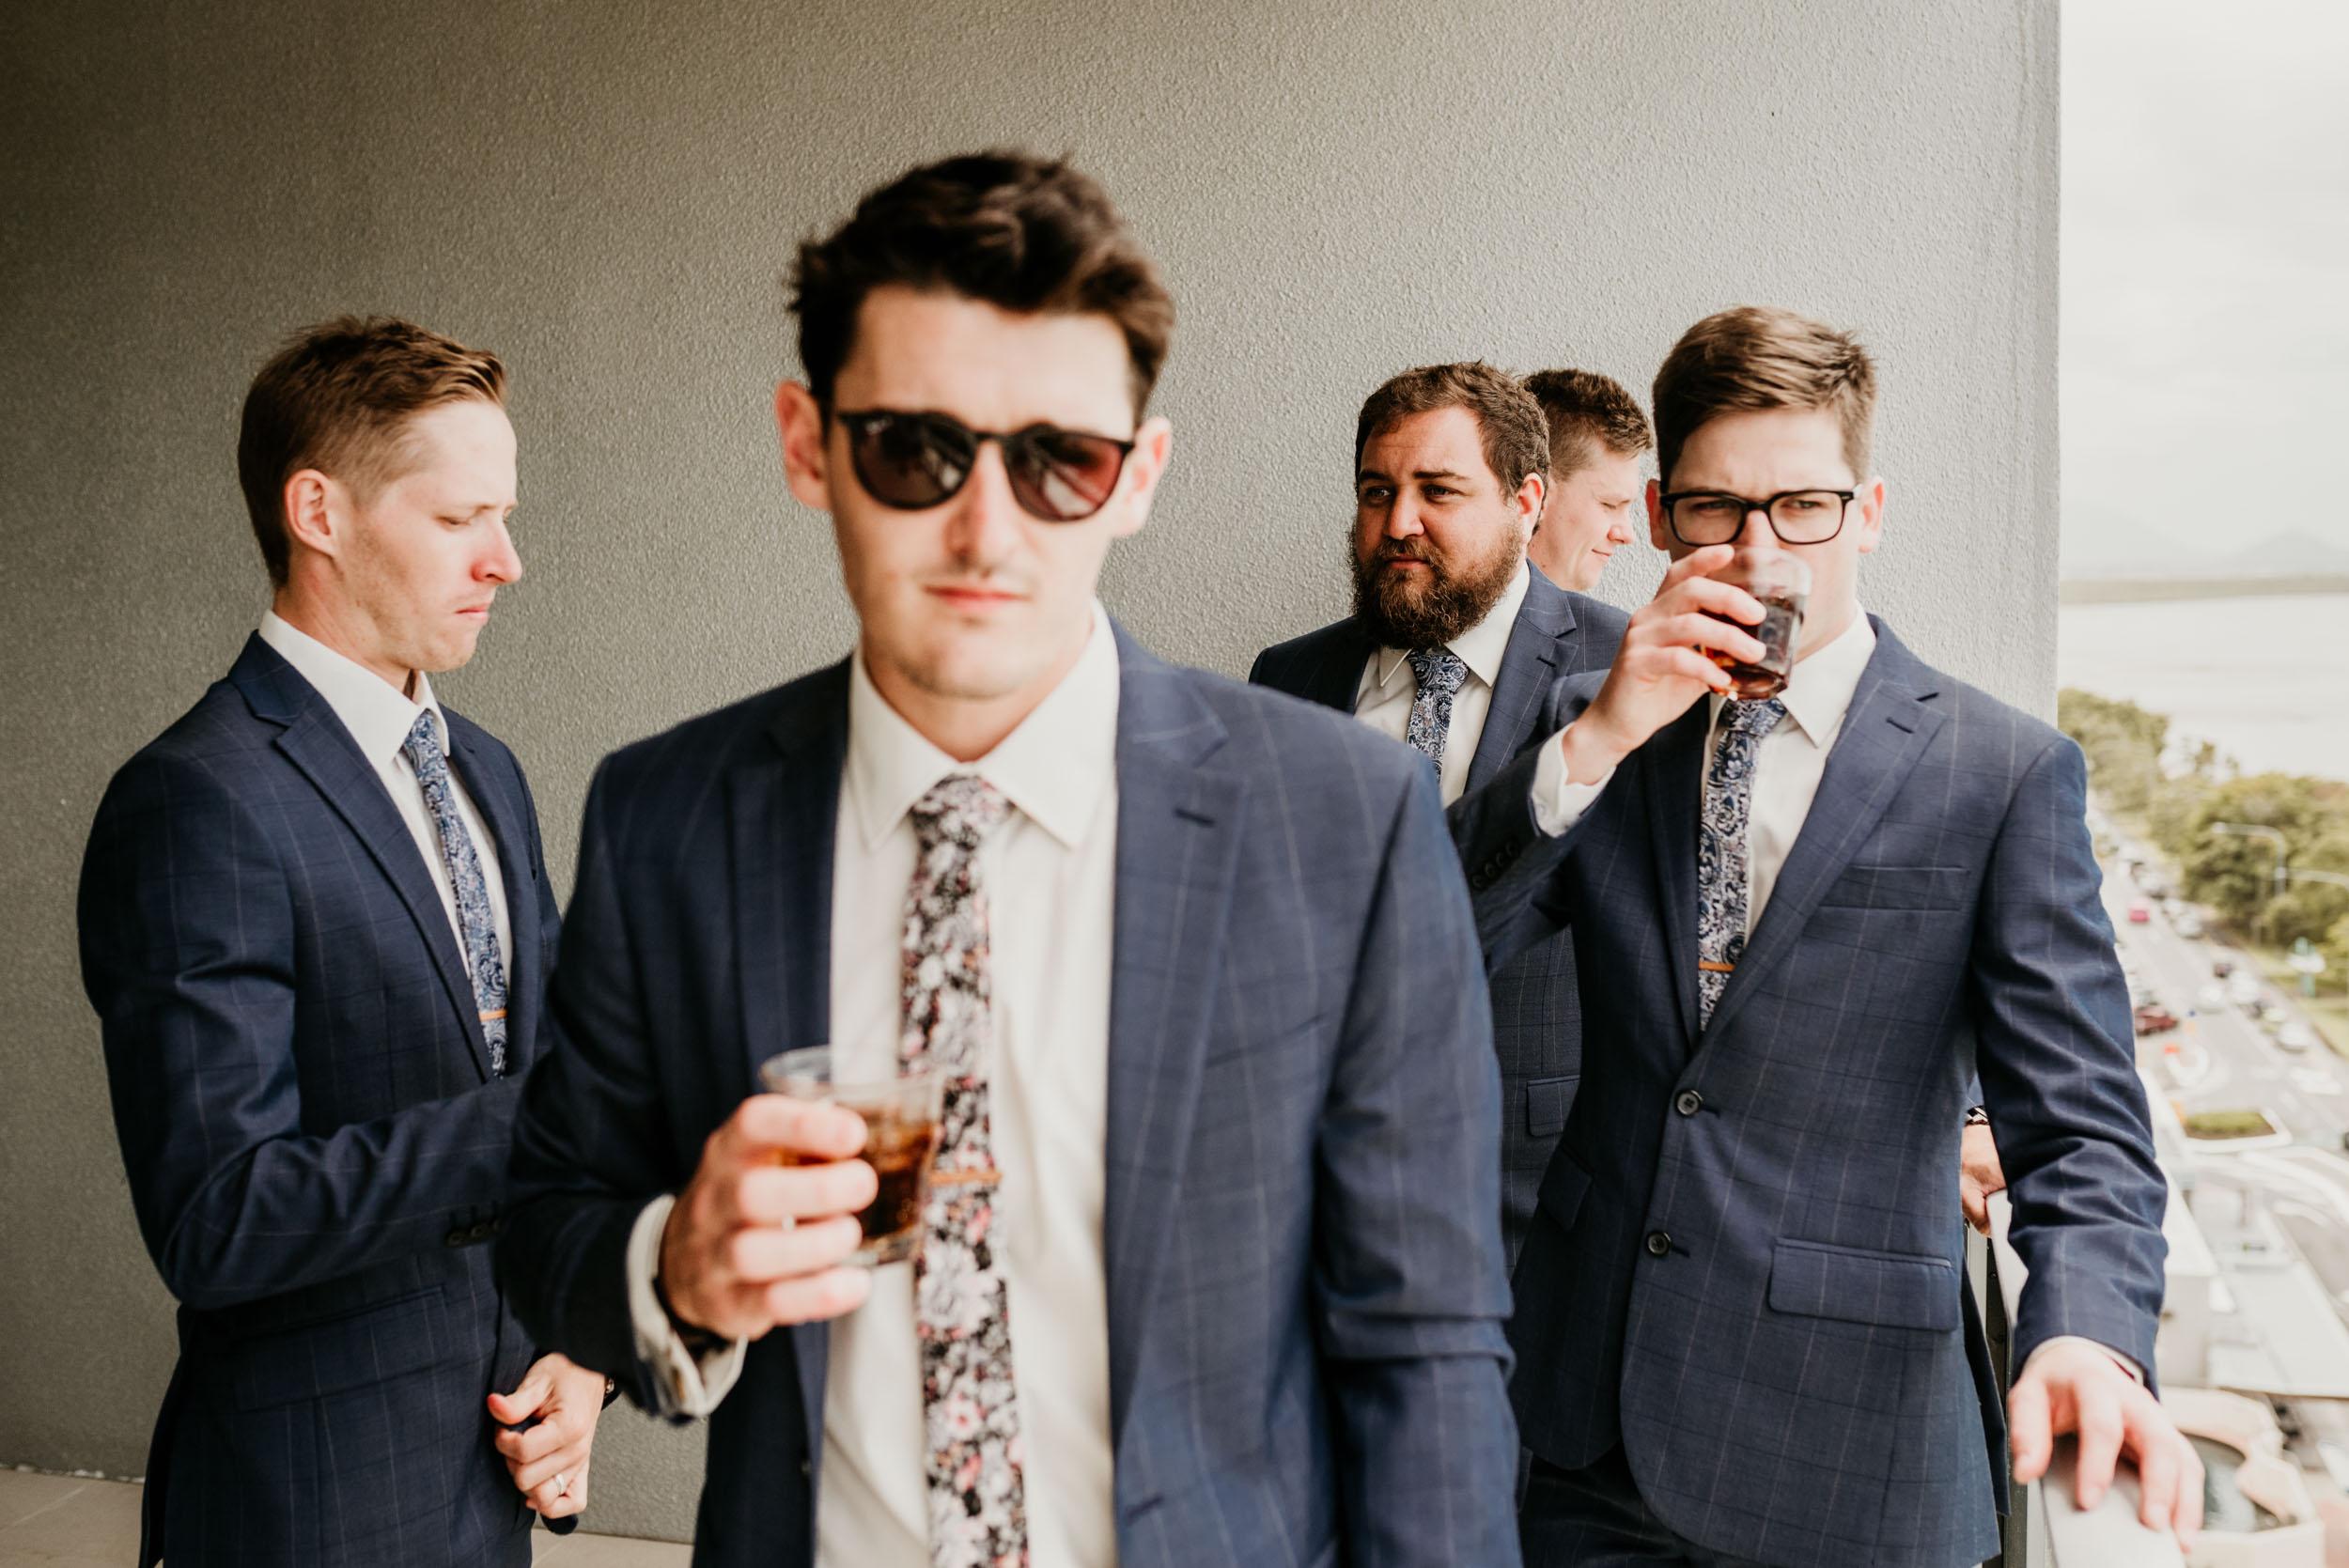 The Raw Photographer - Cairns Wedding Photographer - Laloli - Cairns Garden Wedding - Wedding Dress-5.jpg